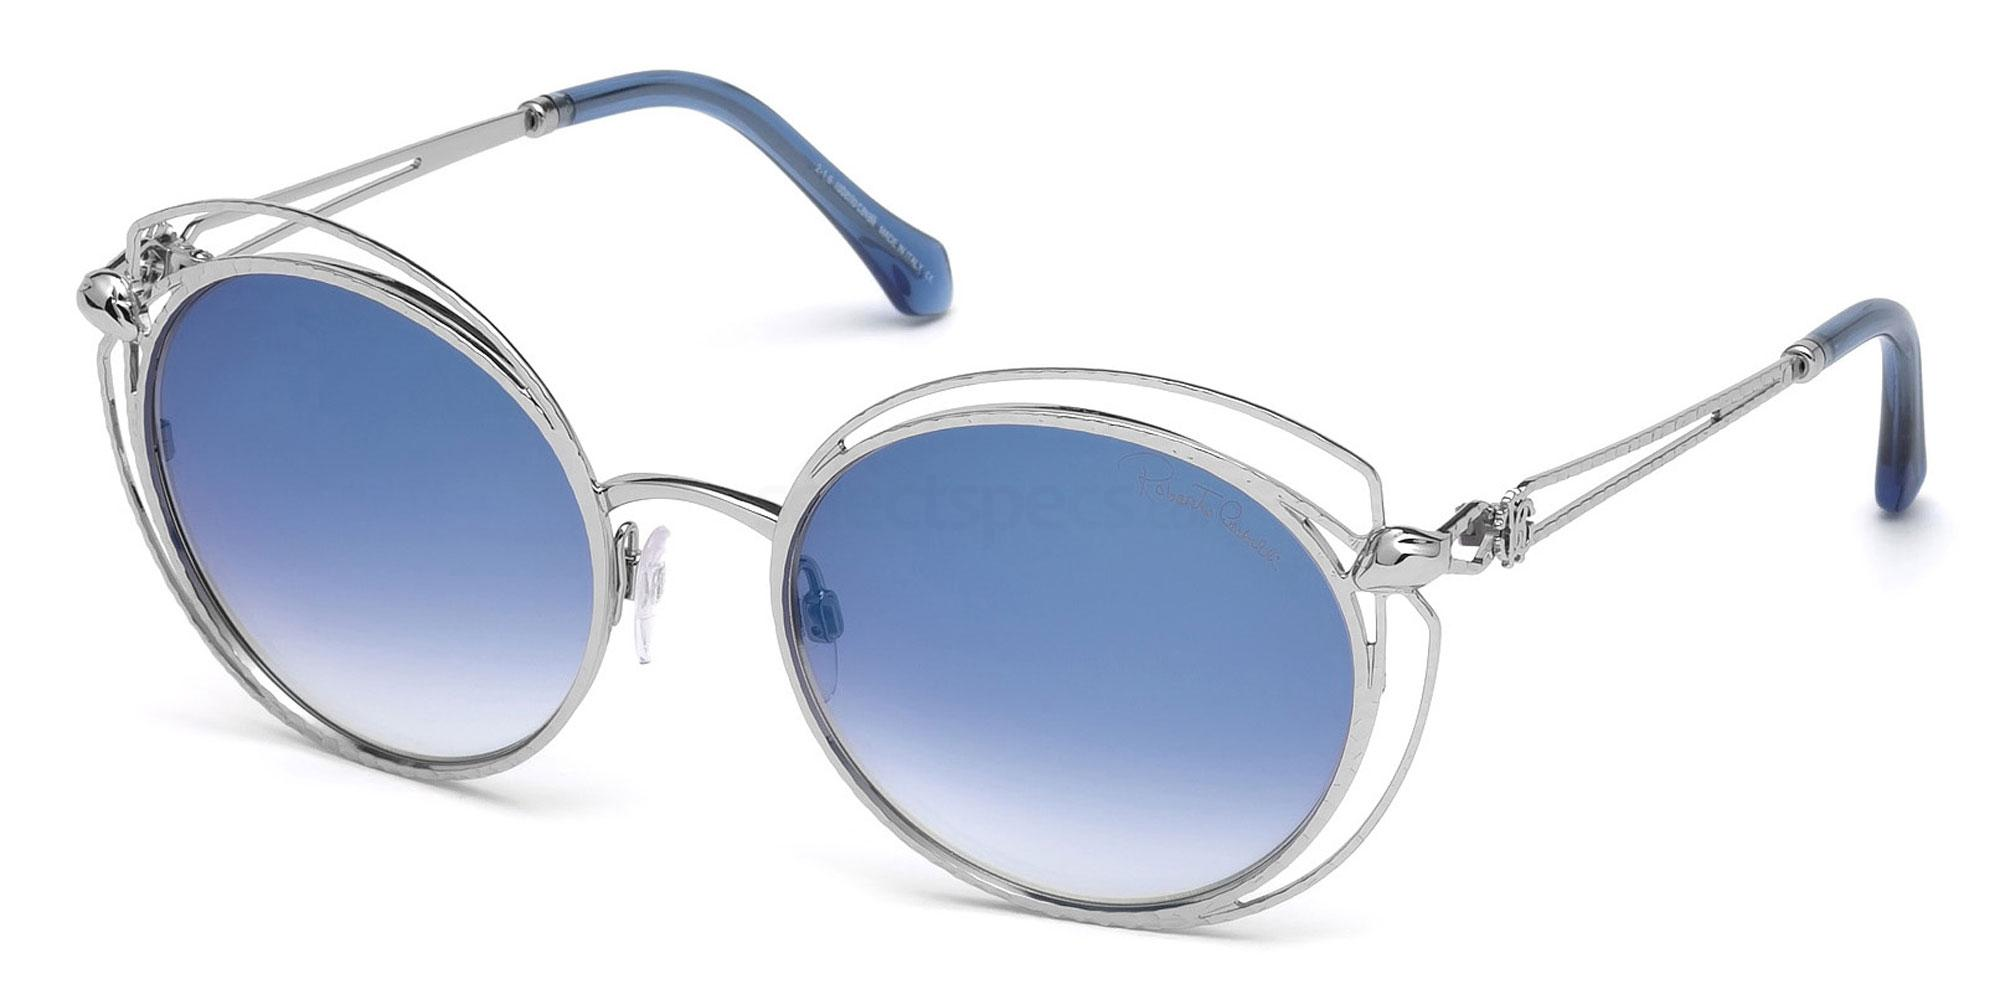 16X RC1030 Sunglasses, Roberto Cavalli